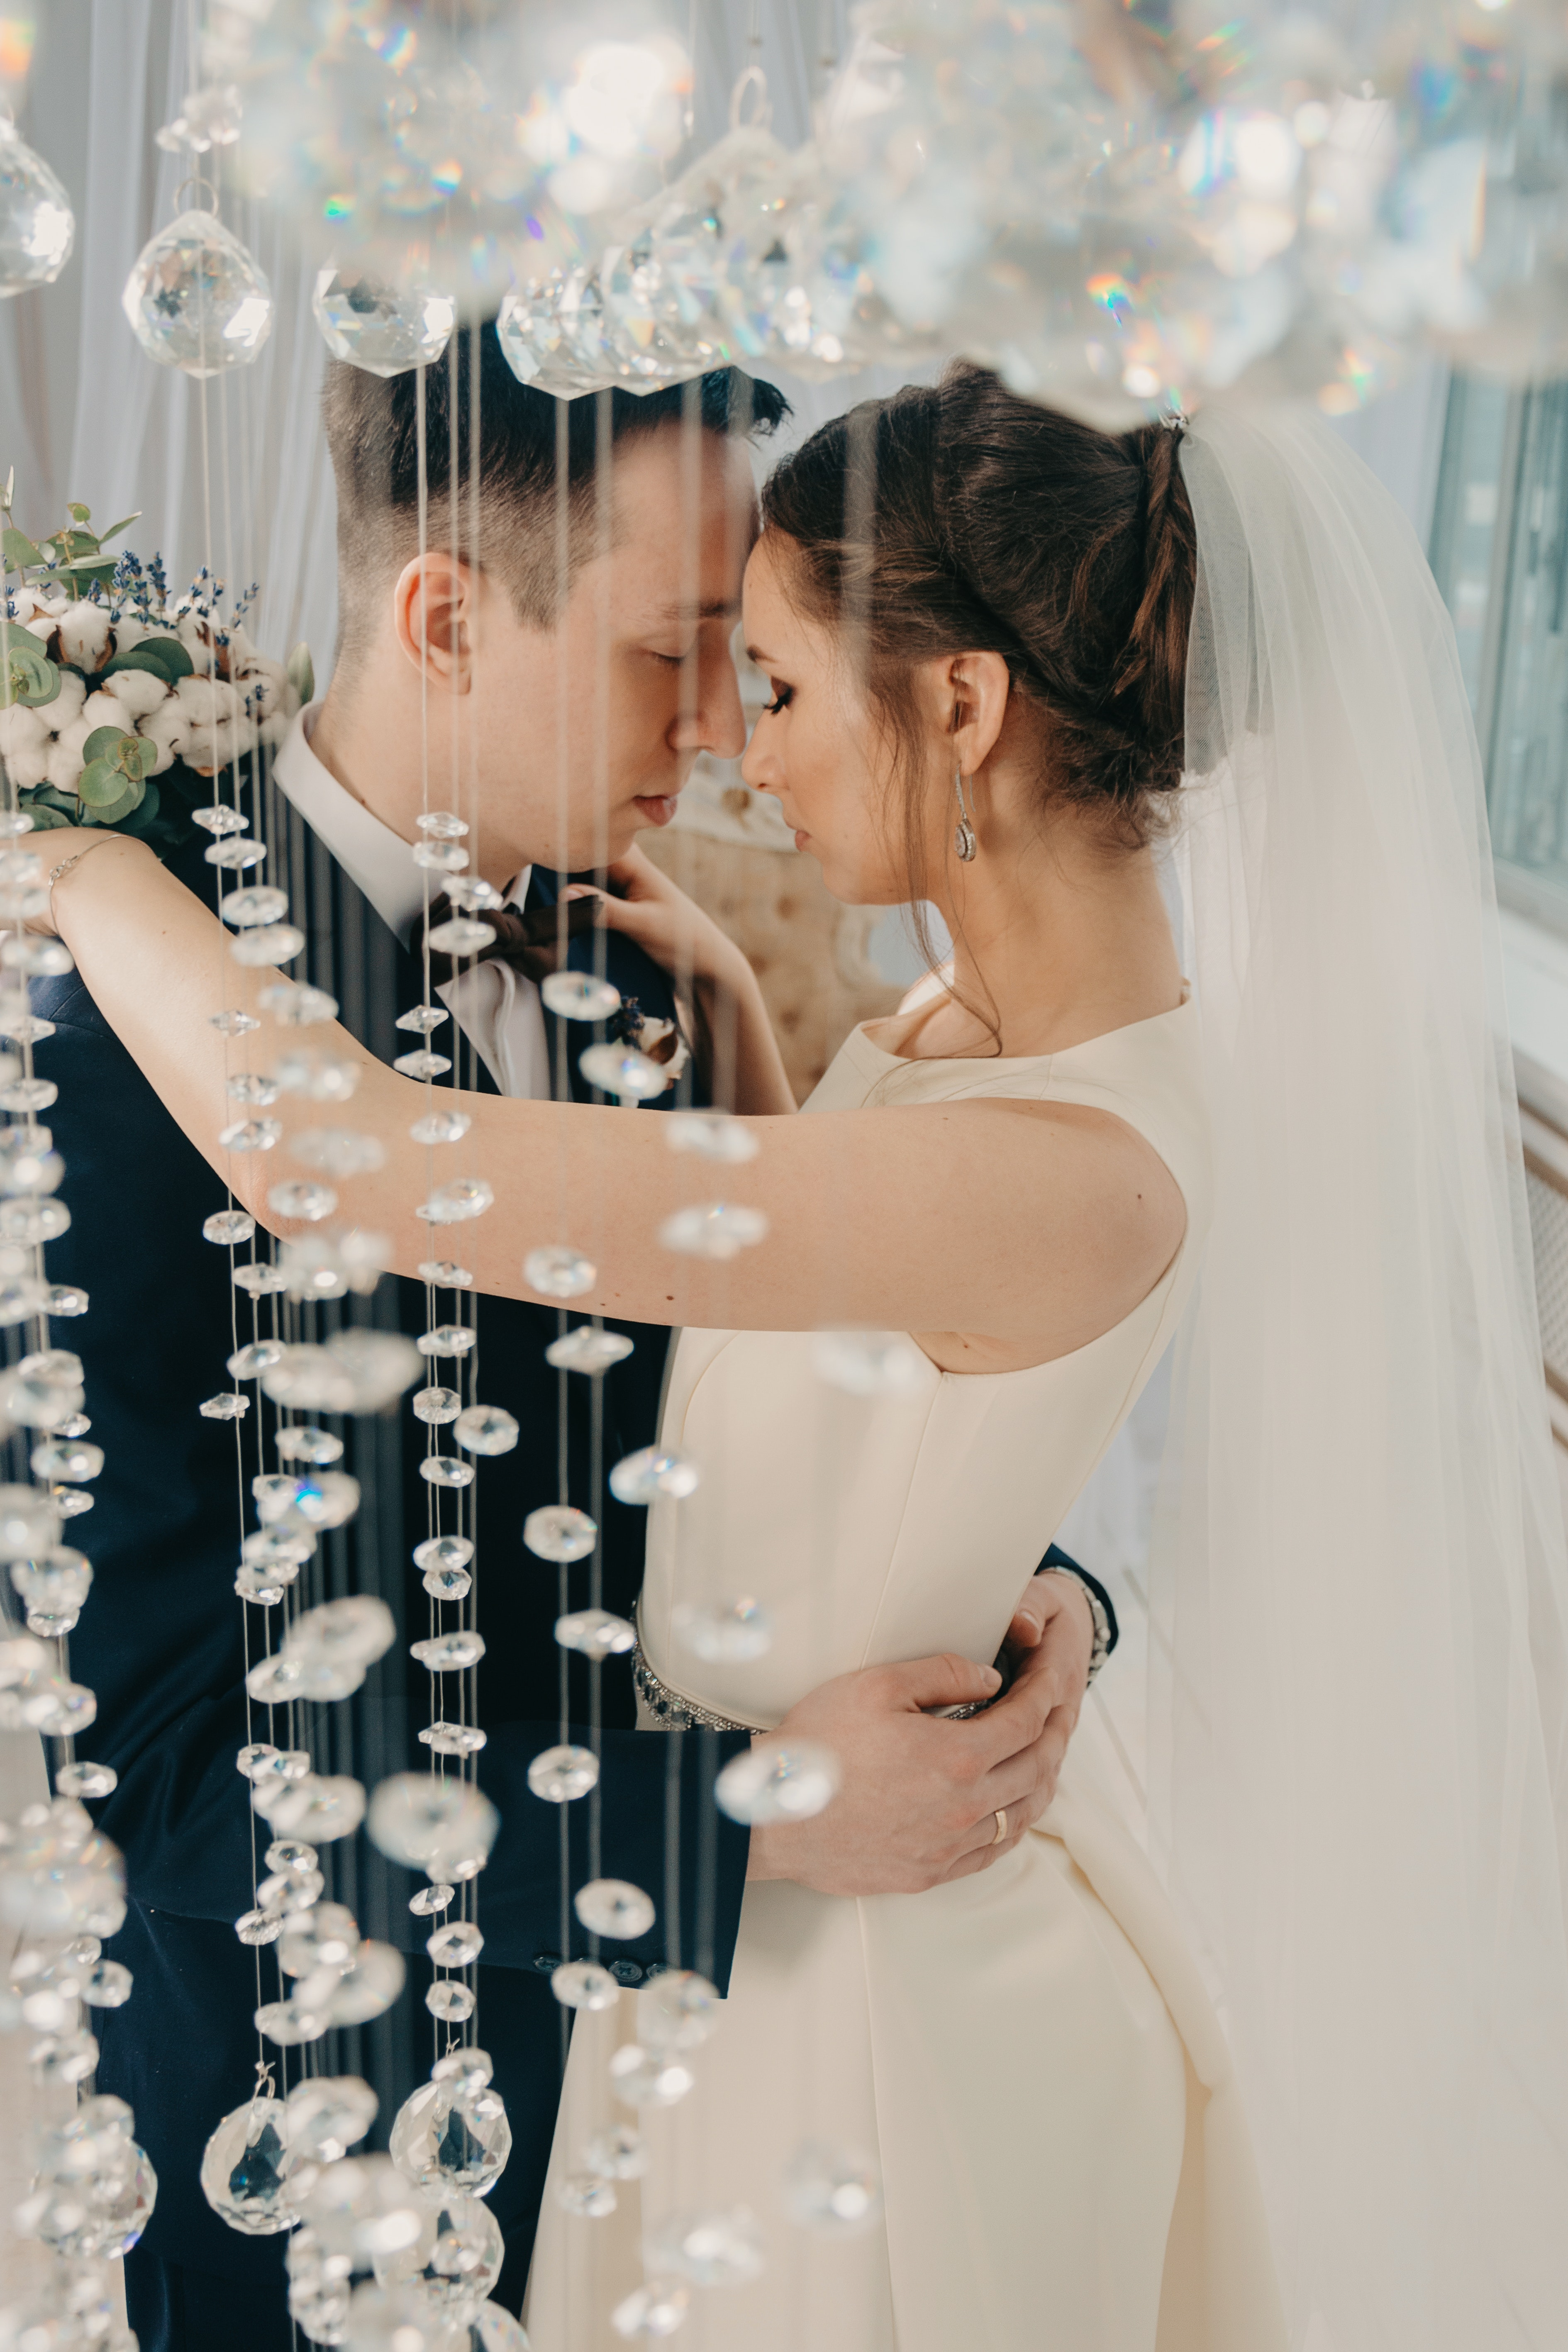 Woman Hugging Man on Wedding, Adults, Indoors, Wedding dress, Wedding, HQ Photo